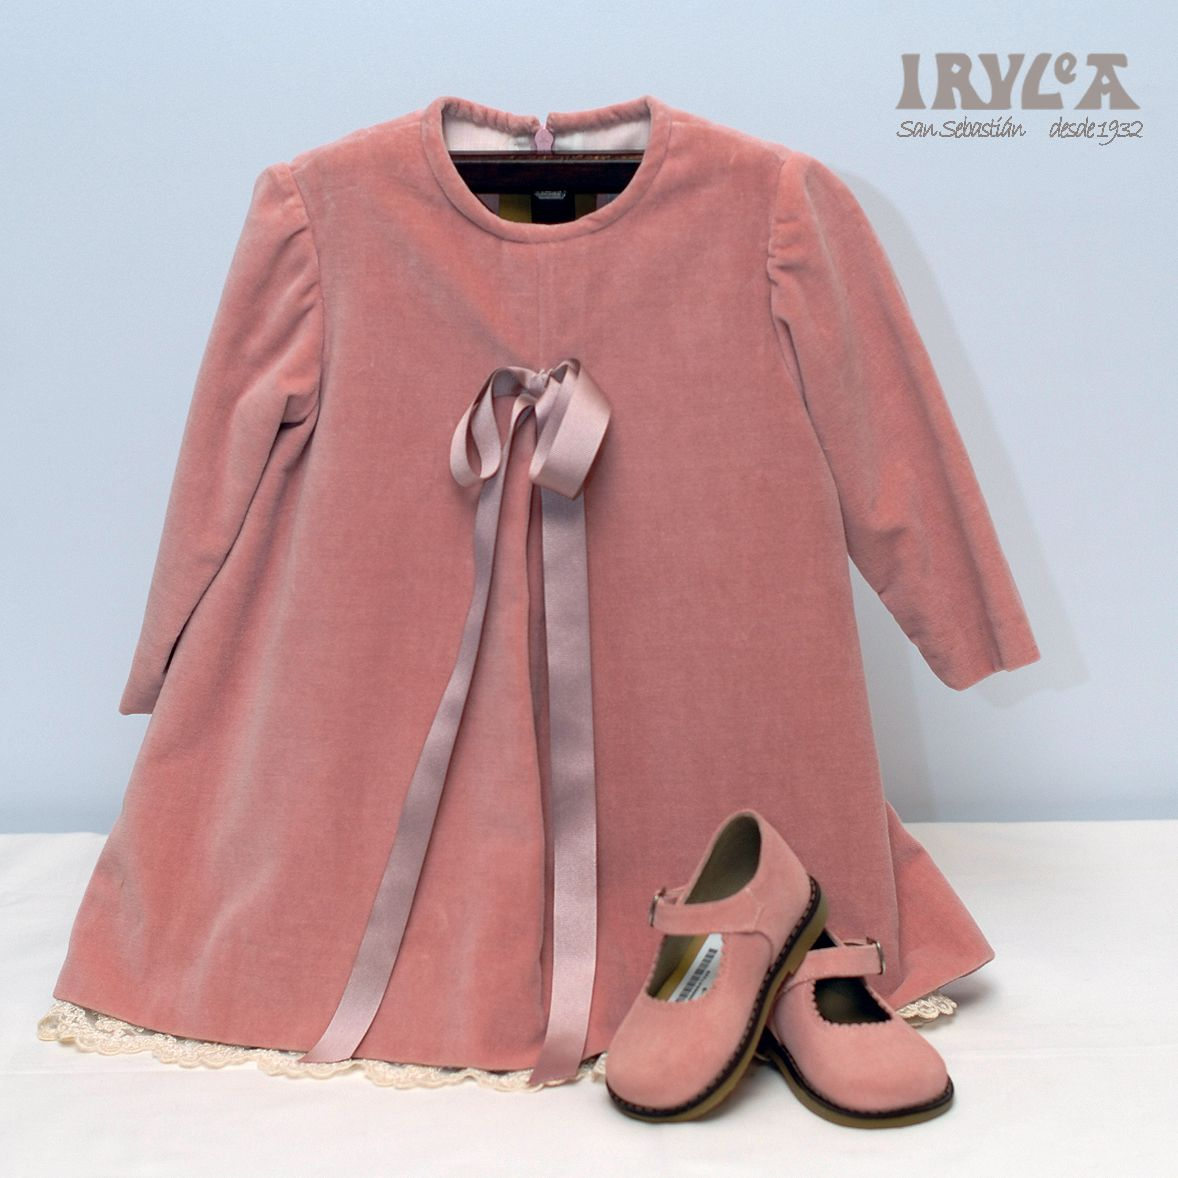 Irulea Moda infantil y lencería femenina. #irulea #donostia ...